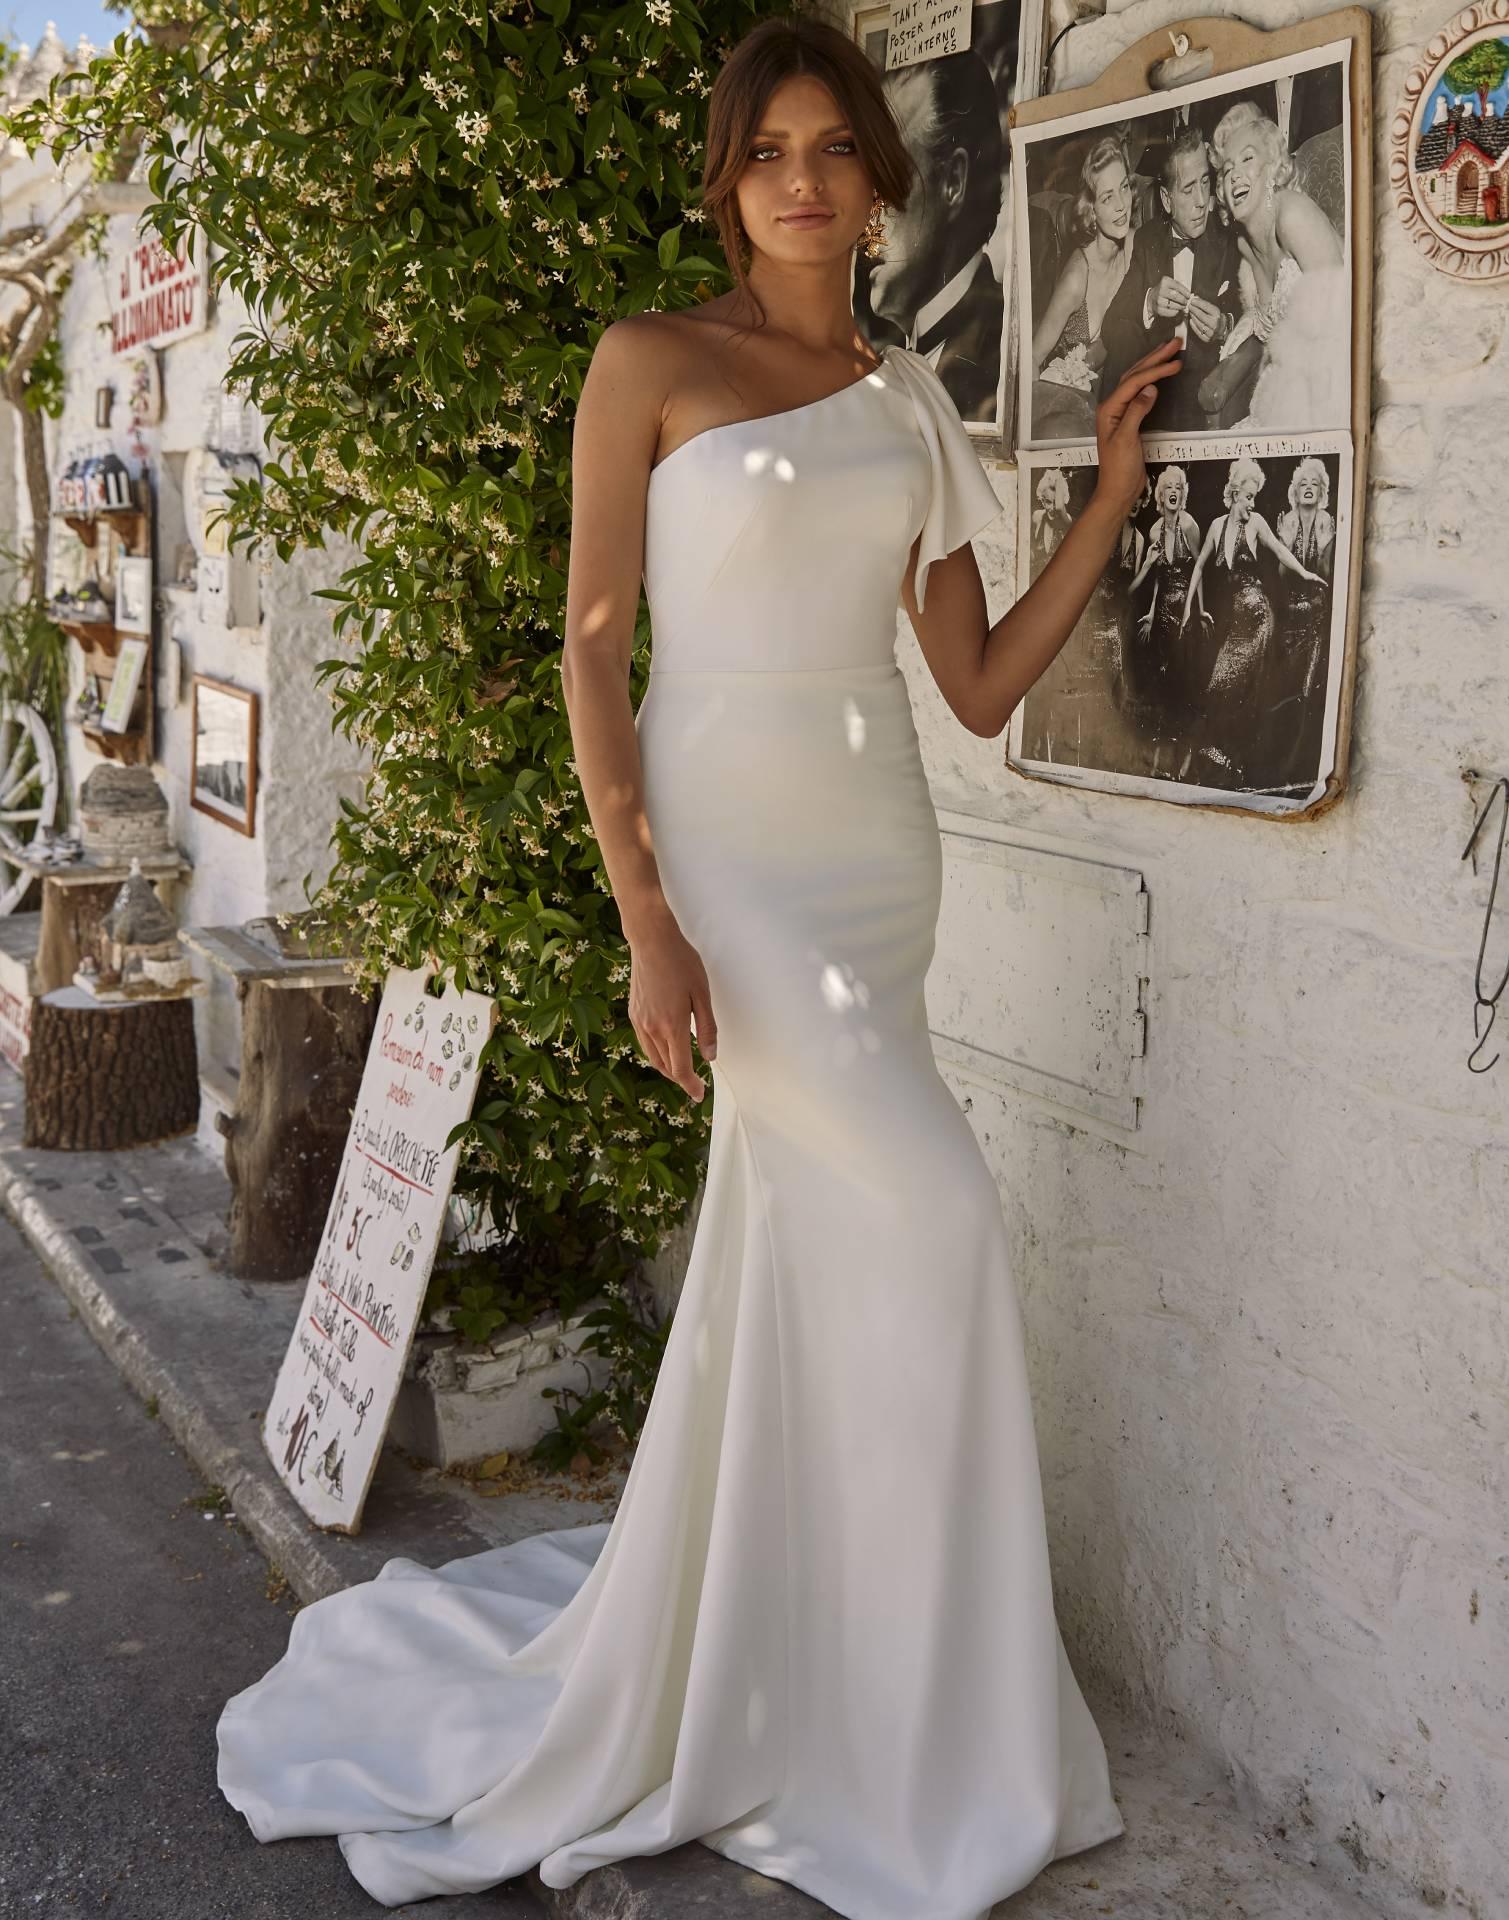 Maddox_wedding_dress_Madi_Lane_collection_front_view-min